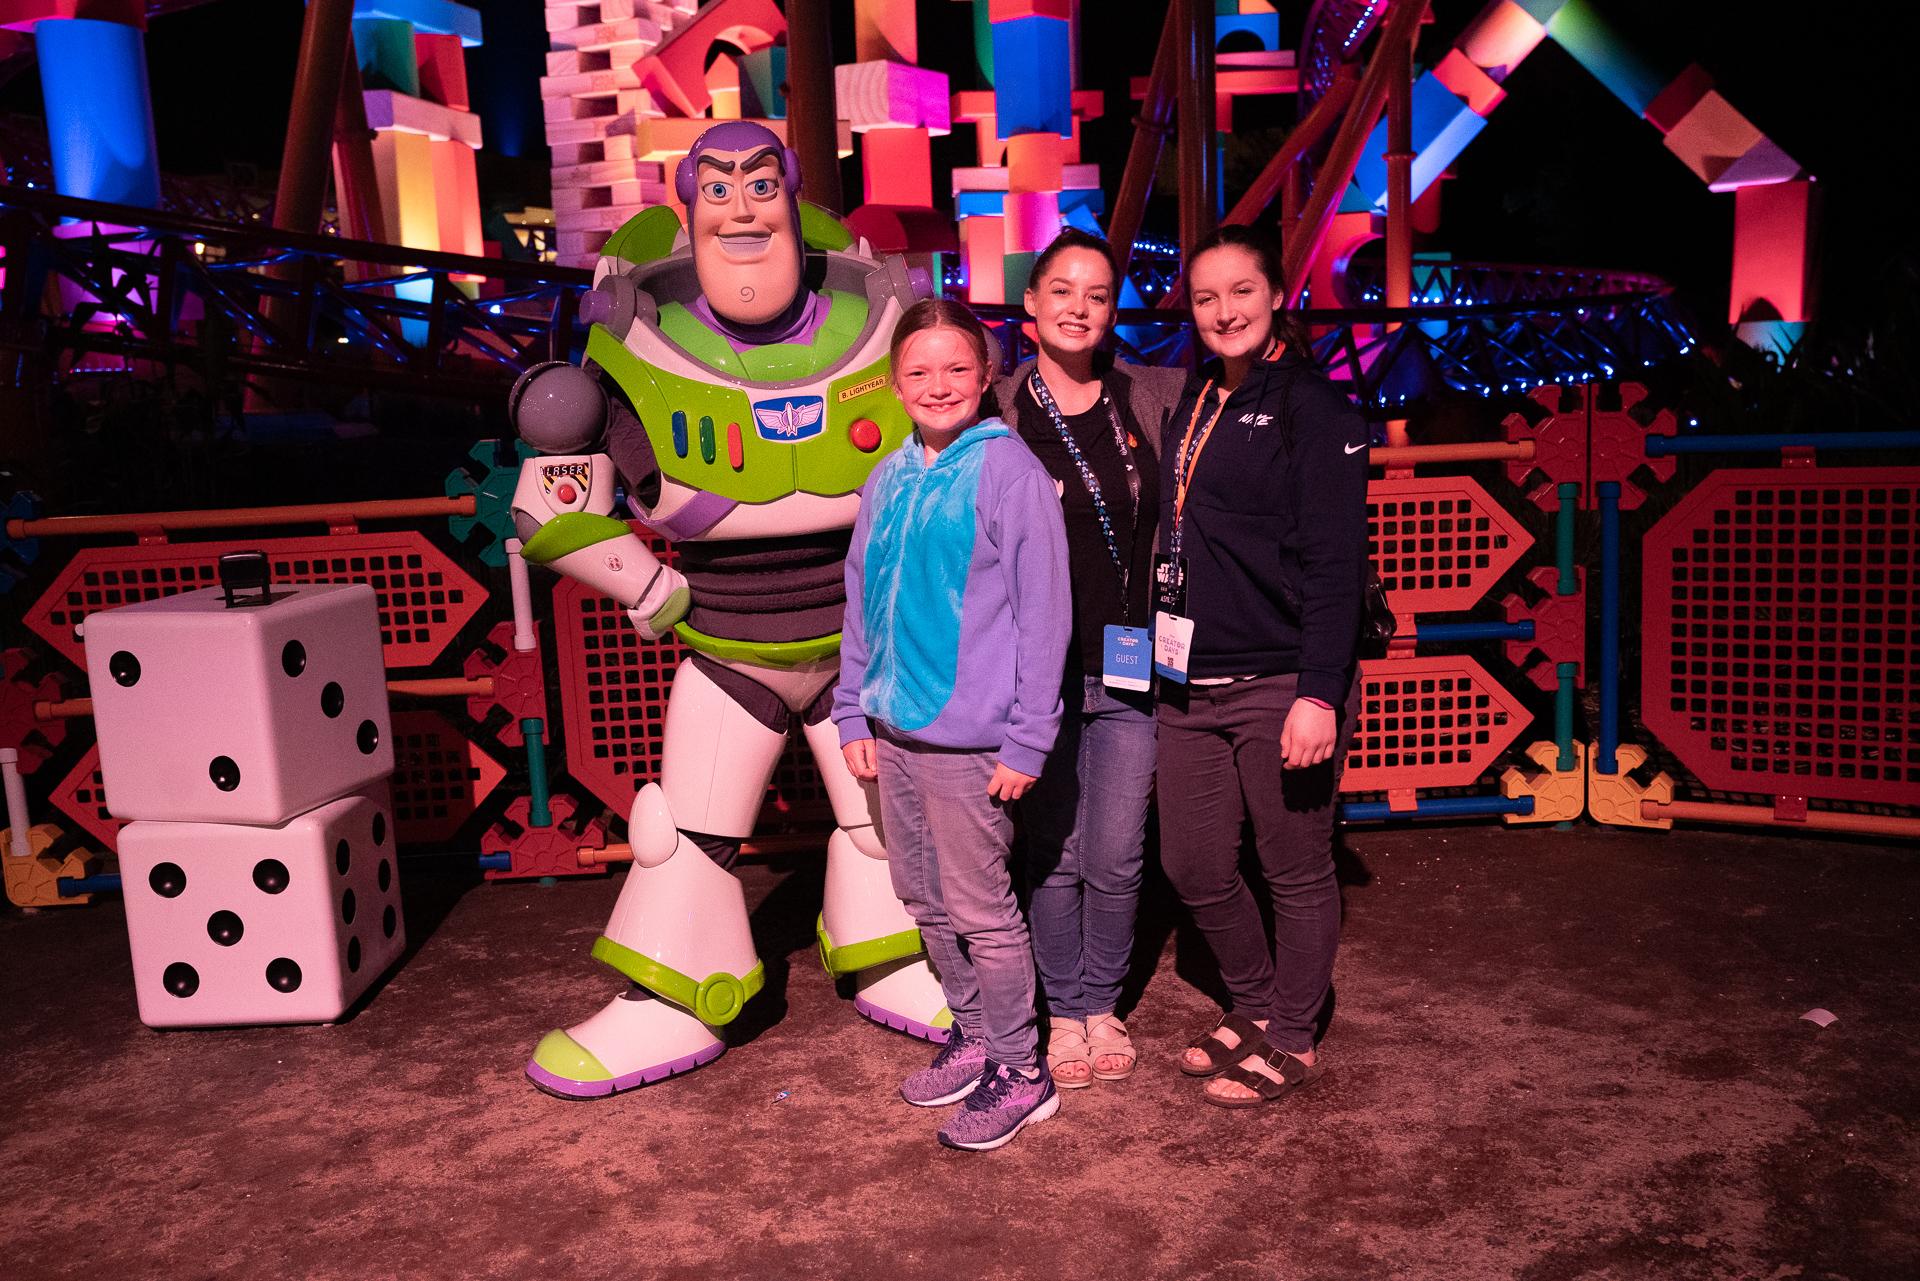 Three girls posing with Buzz Lightyear in Toy Story Land at Disney's Hollywood Studios at Walt Disney World